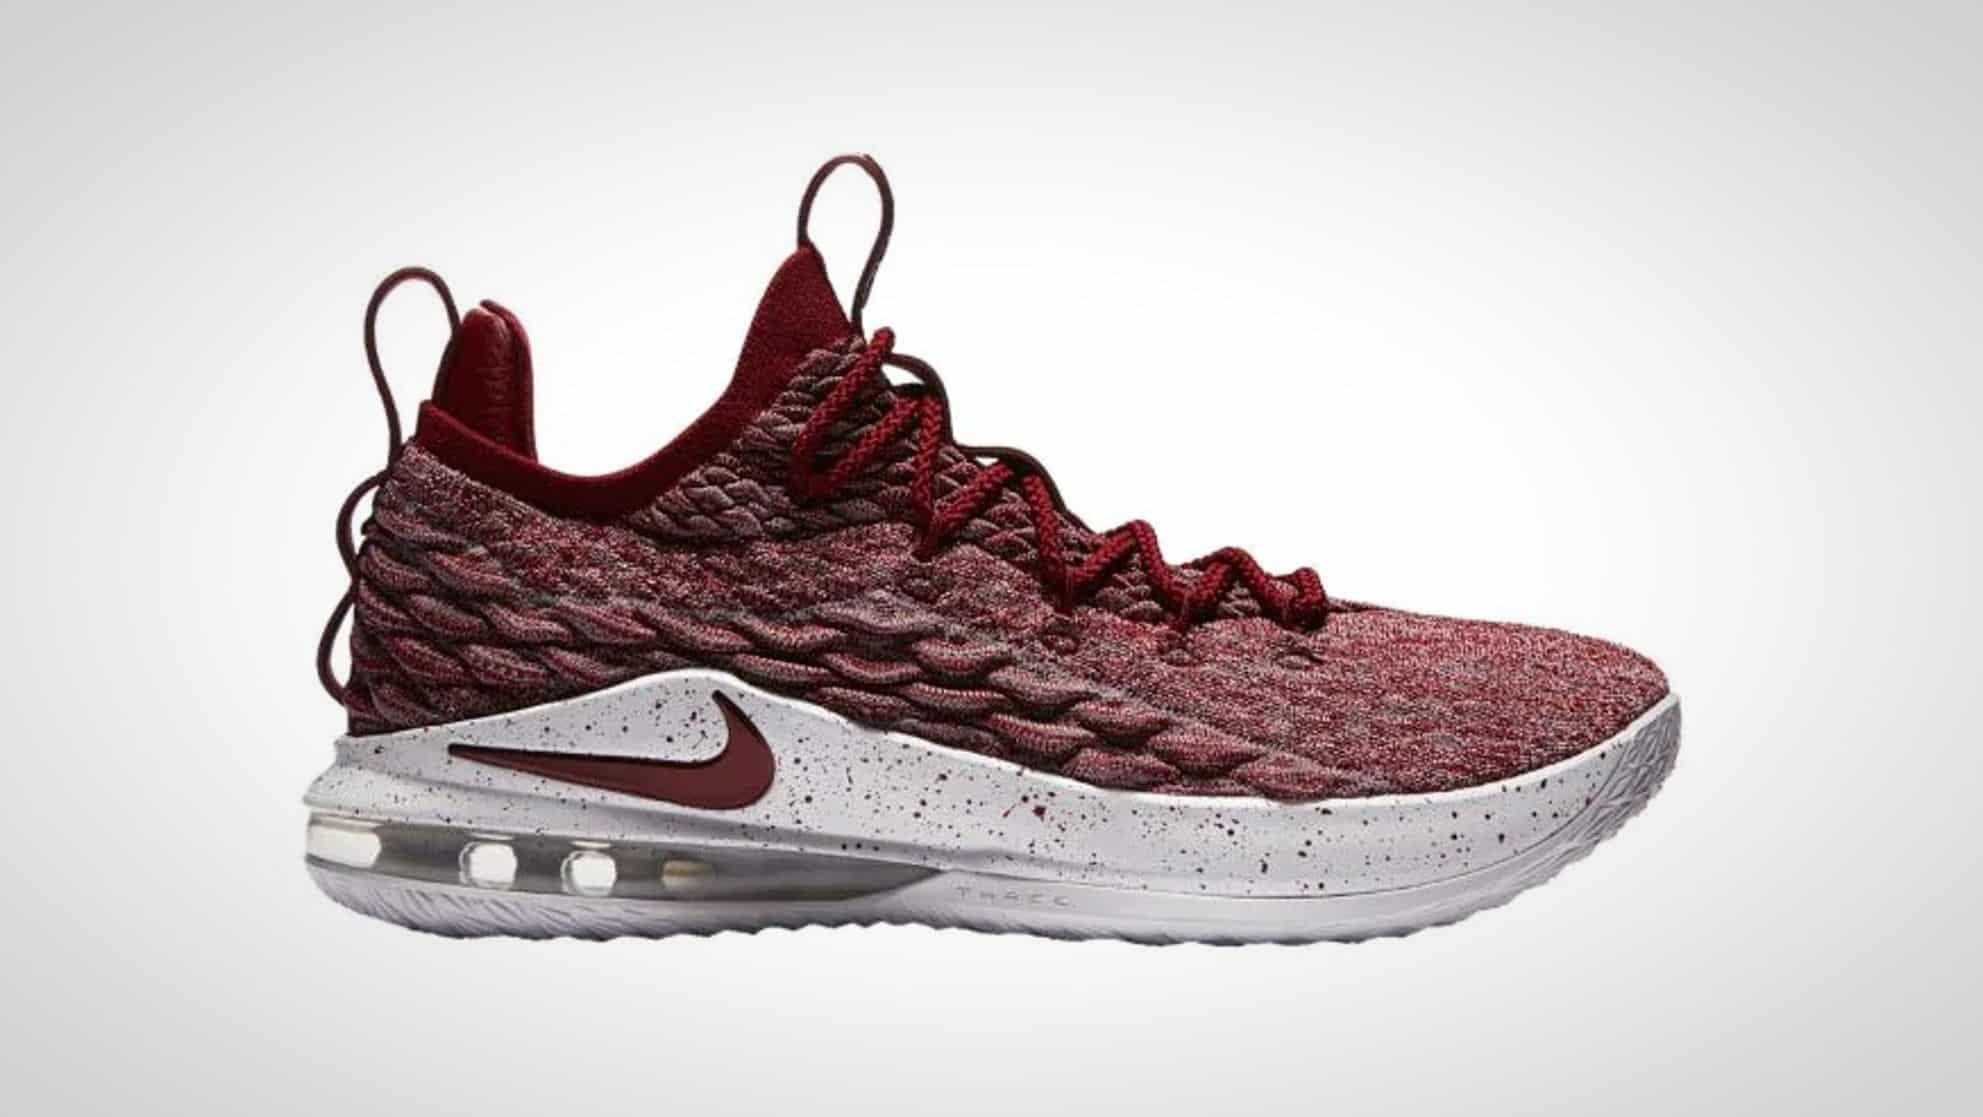 141c9719bb35 Nike Lebron 15 Low Shoe Review - BestOutdoorBasketball